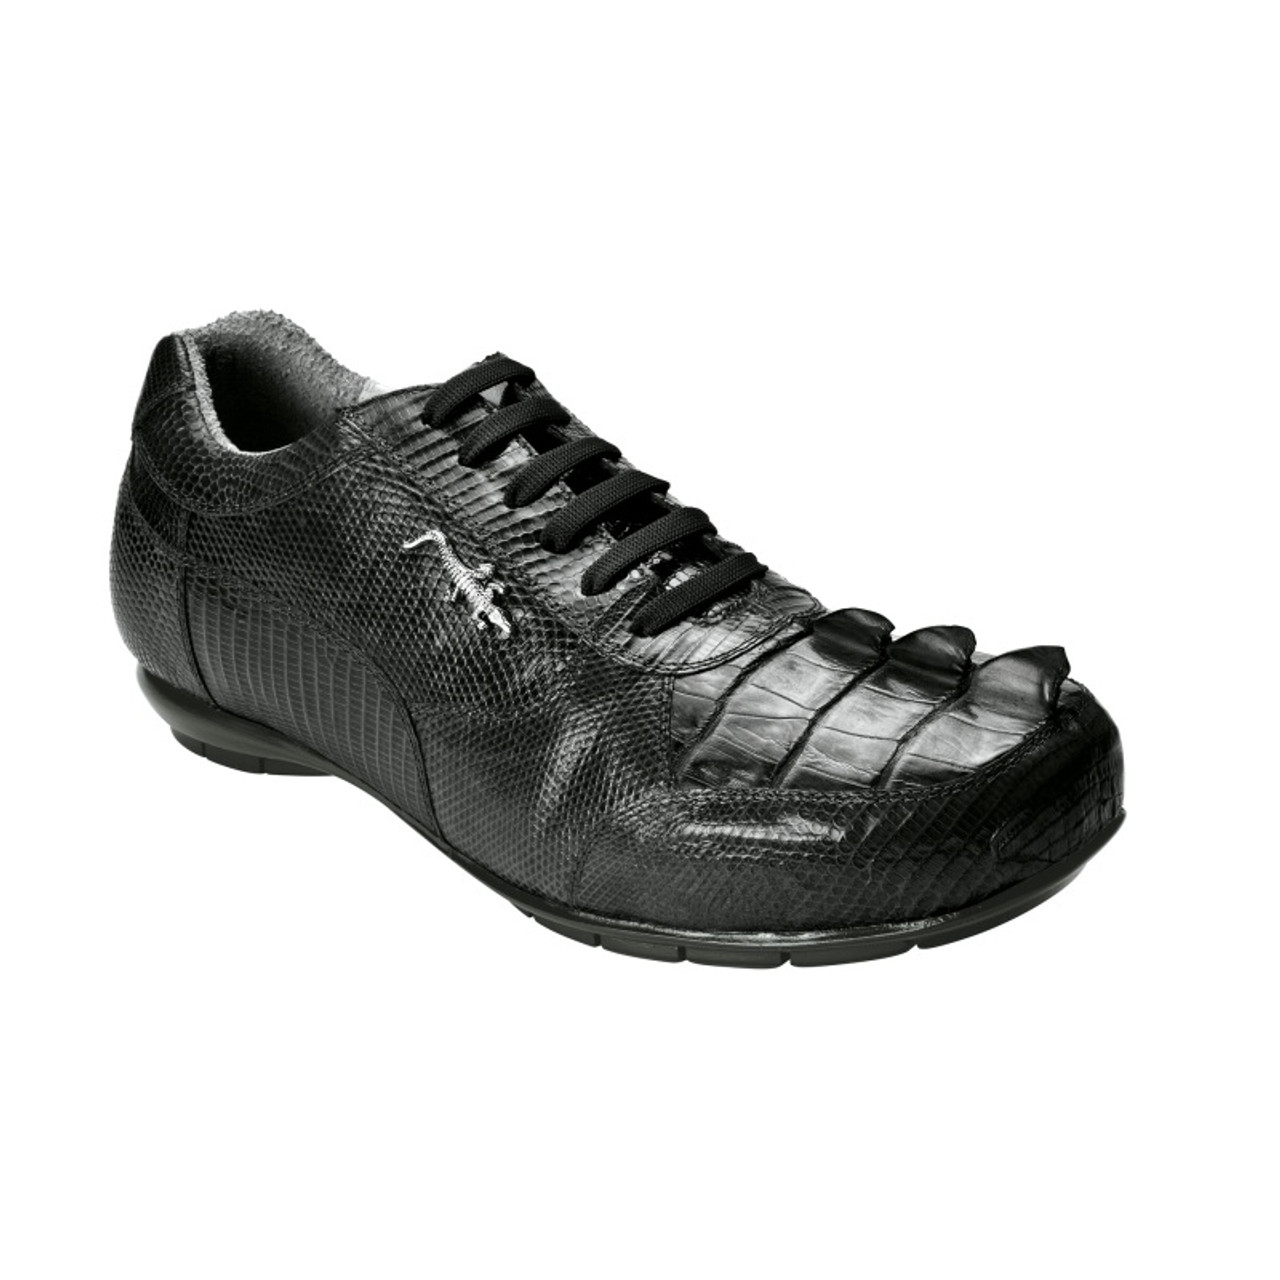 43b6c3eb Belvedere Cresta hornback and lizard soft bottom shoe.